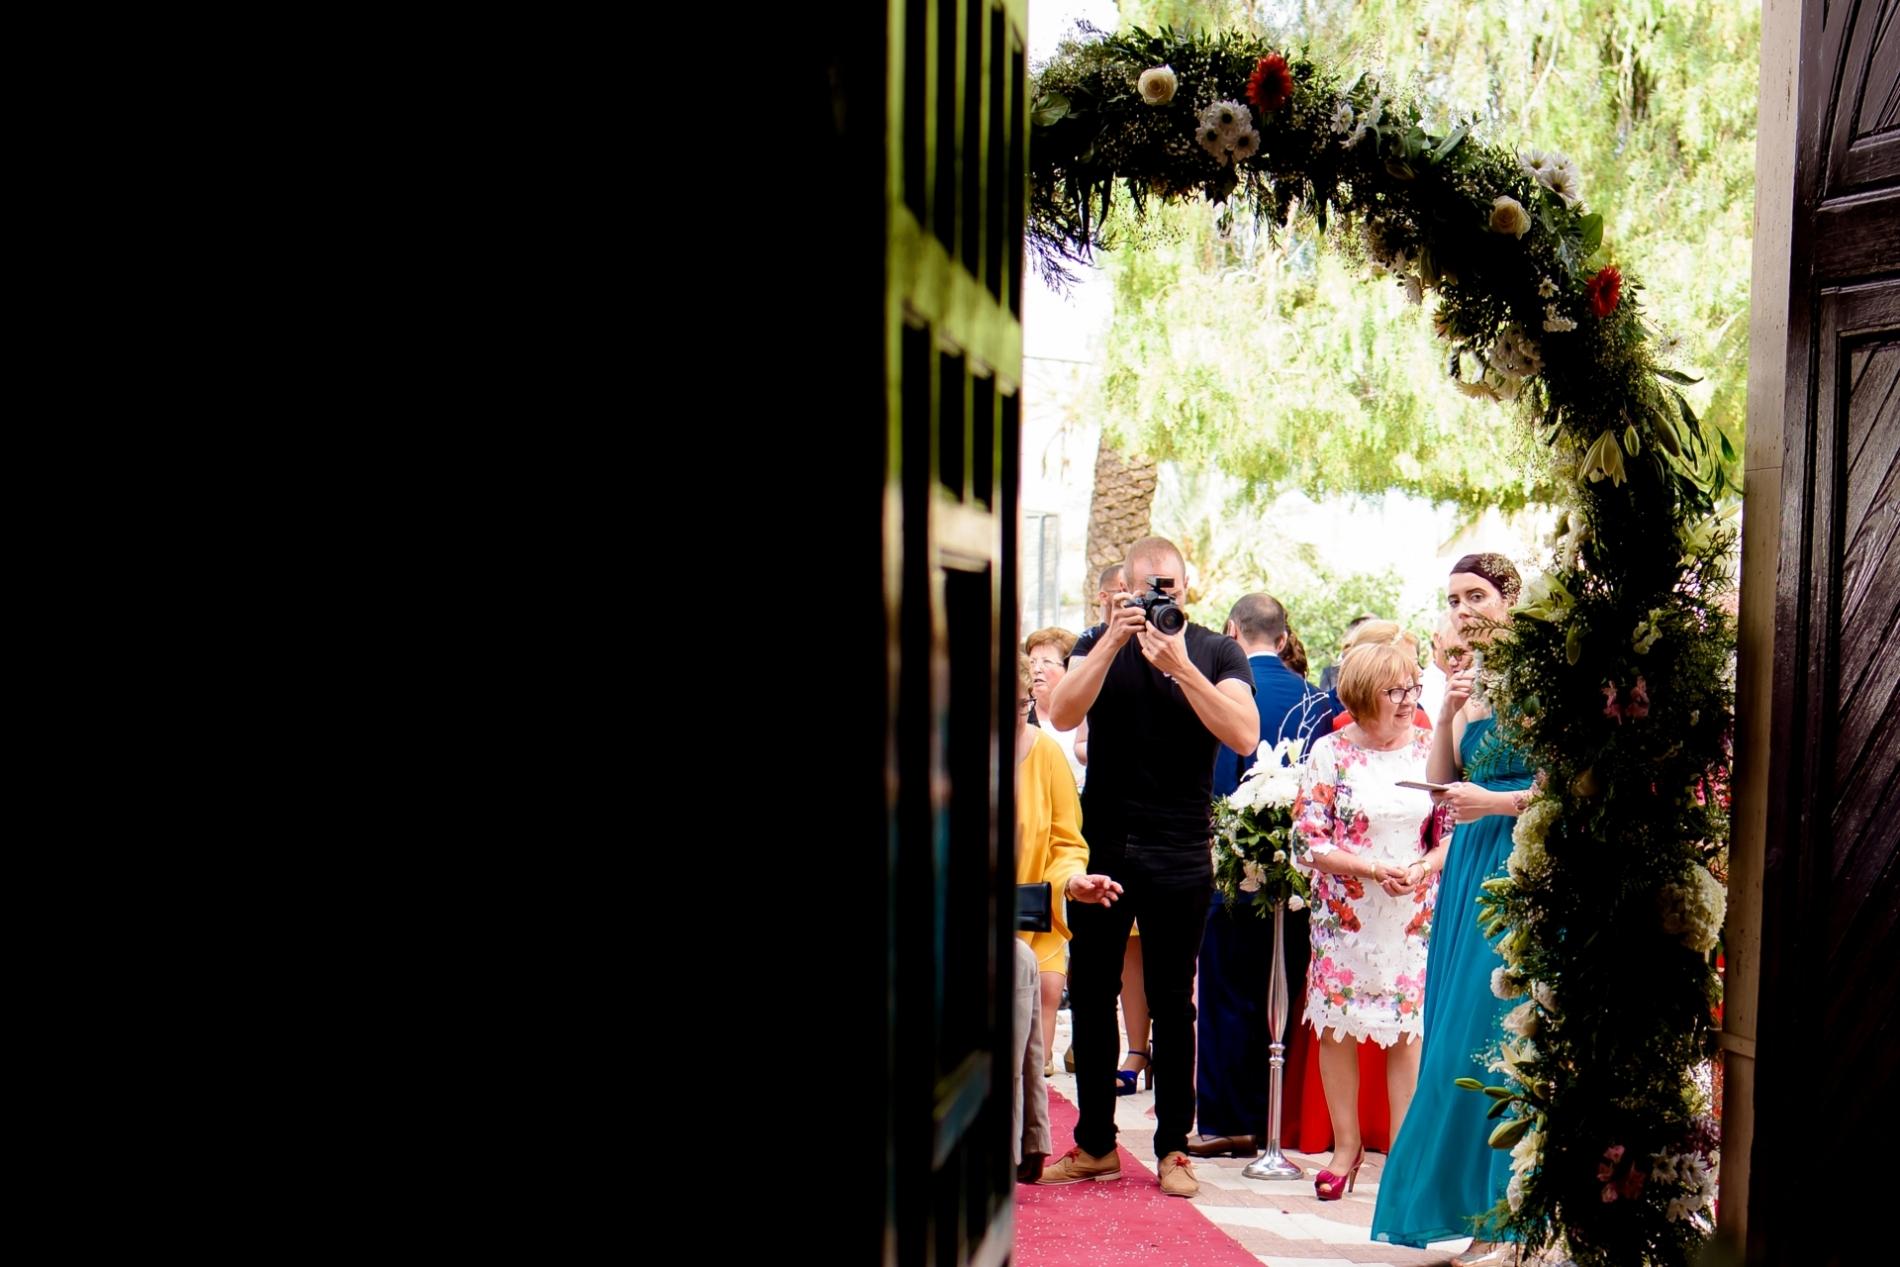 Spain and Murcia wedding photographer Eduardo Blanco working with camera